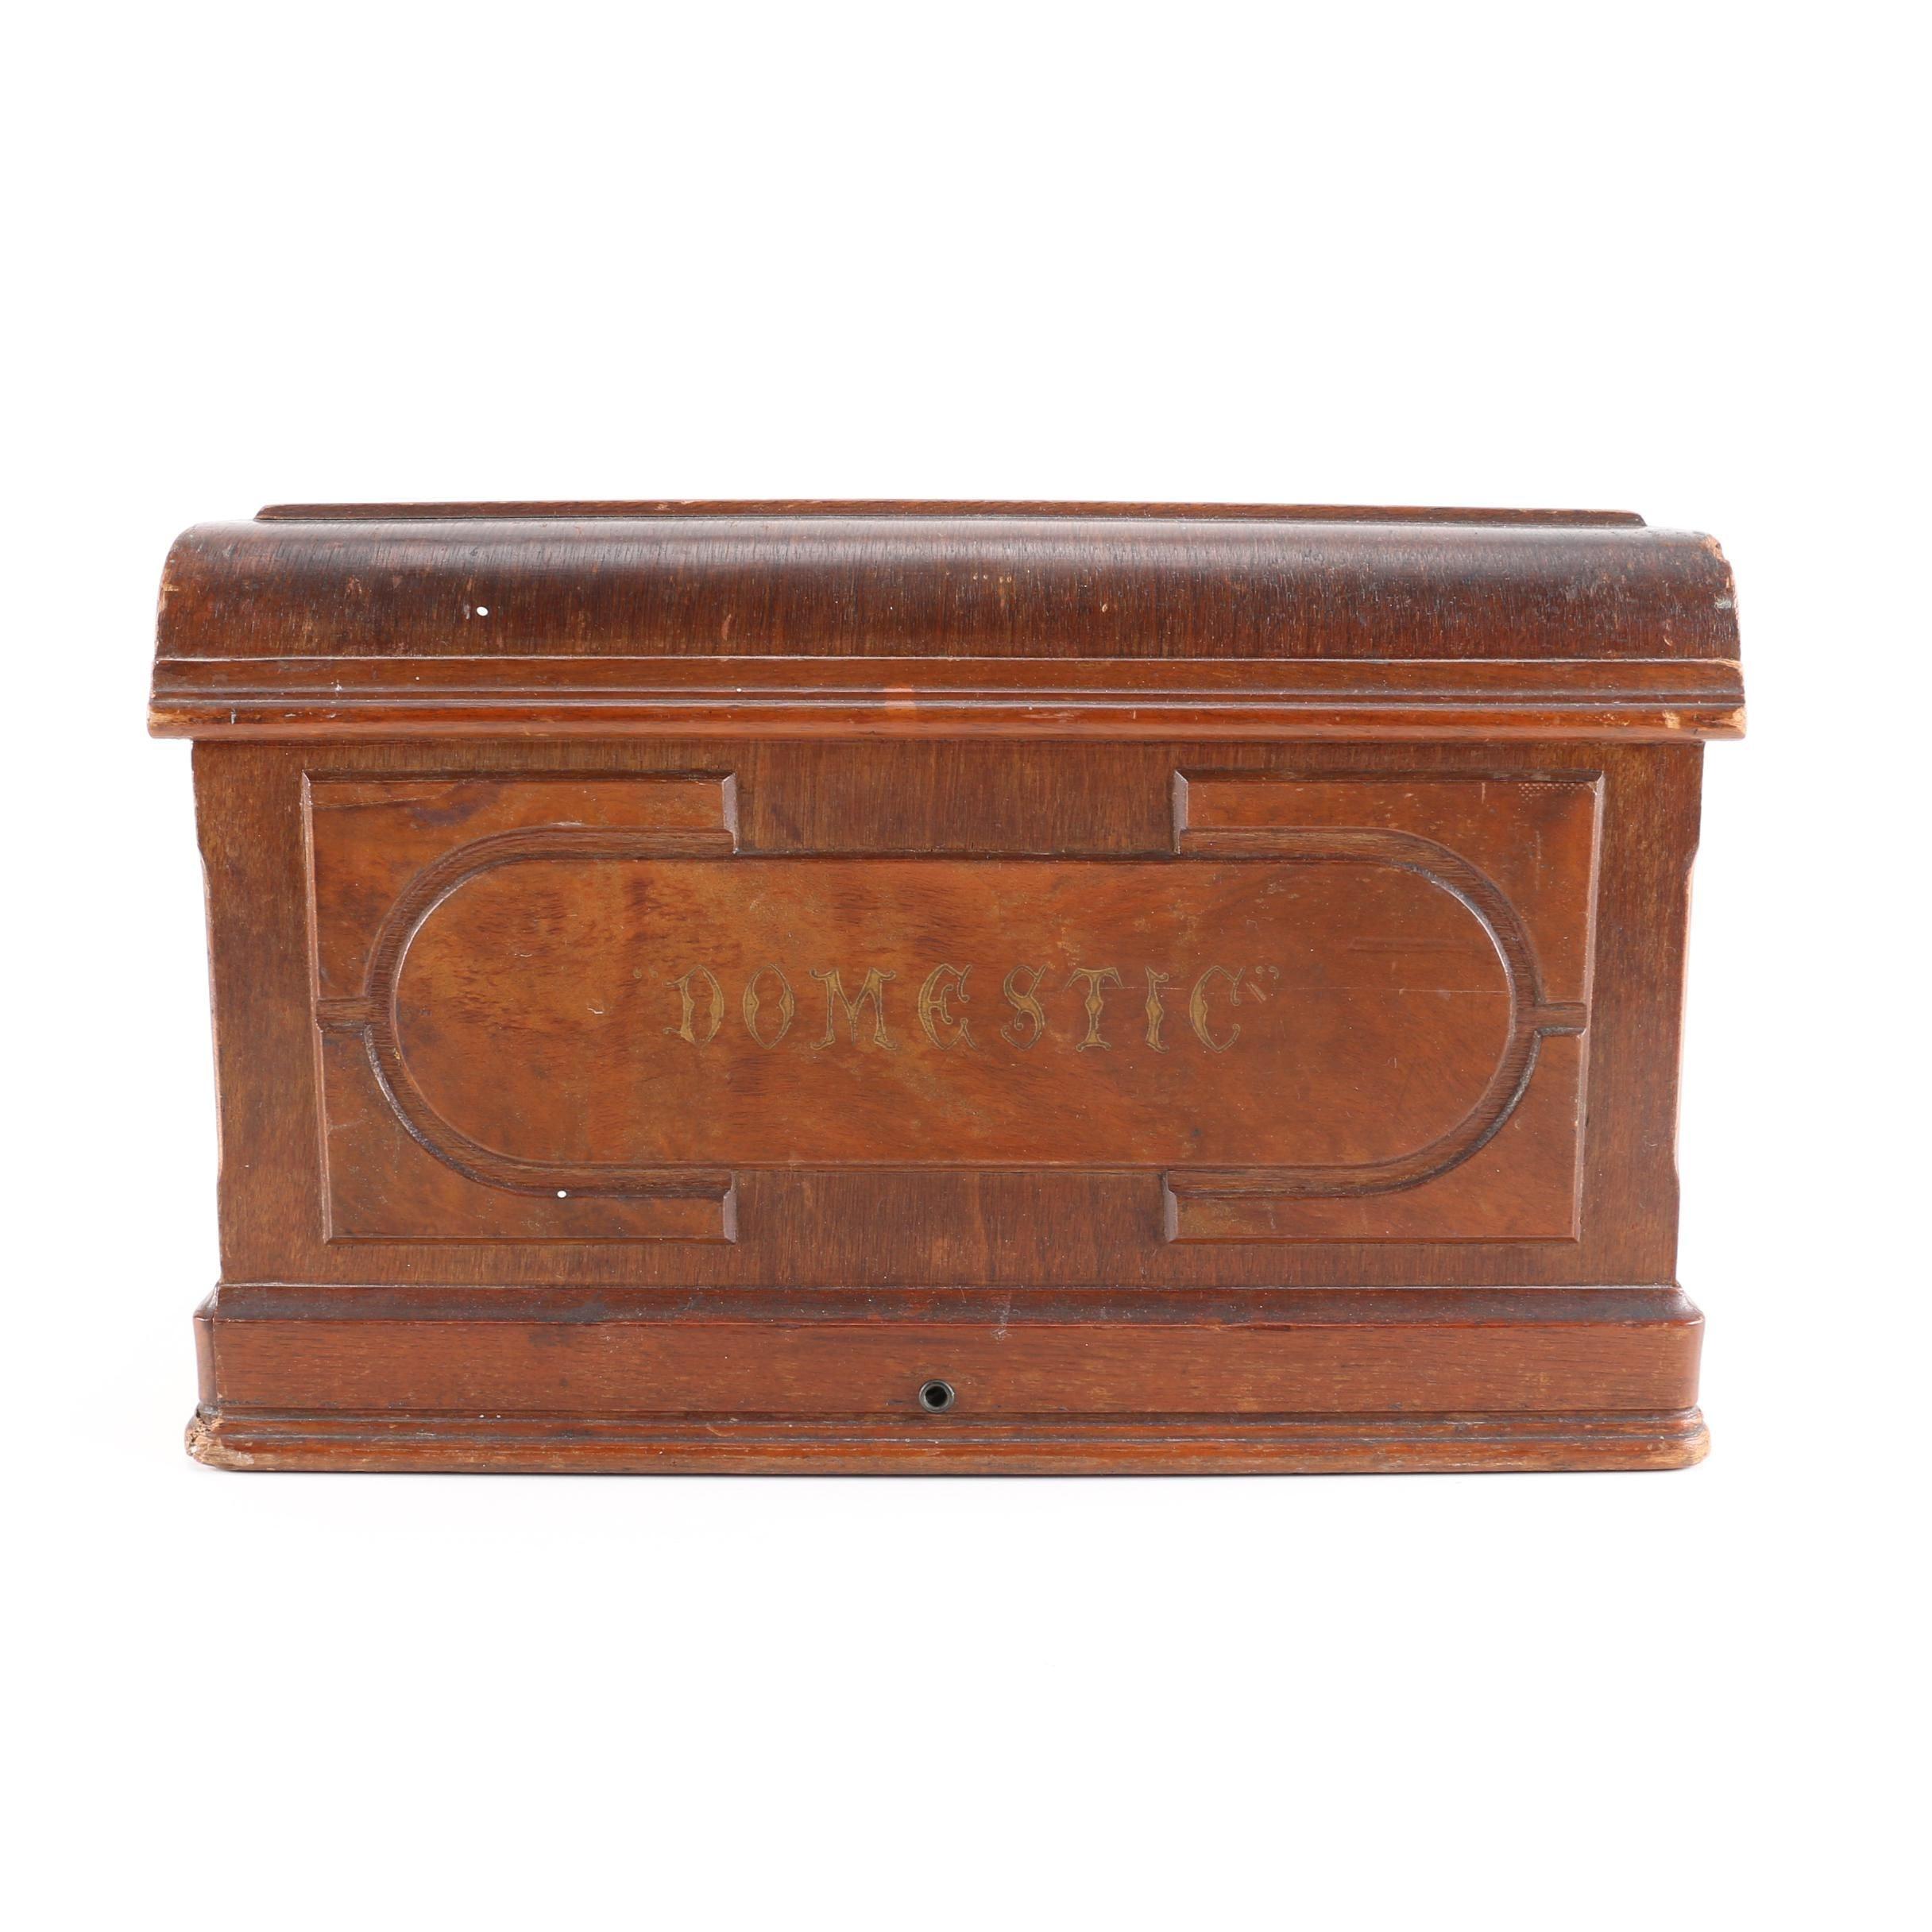 domestic antique sewing machine